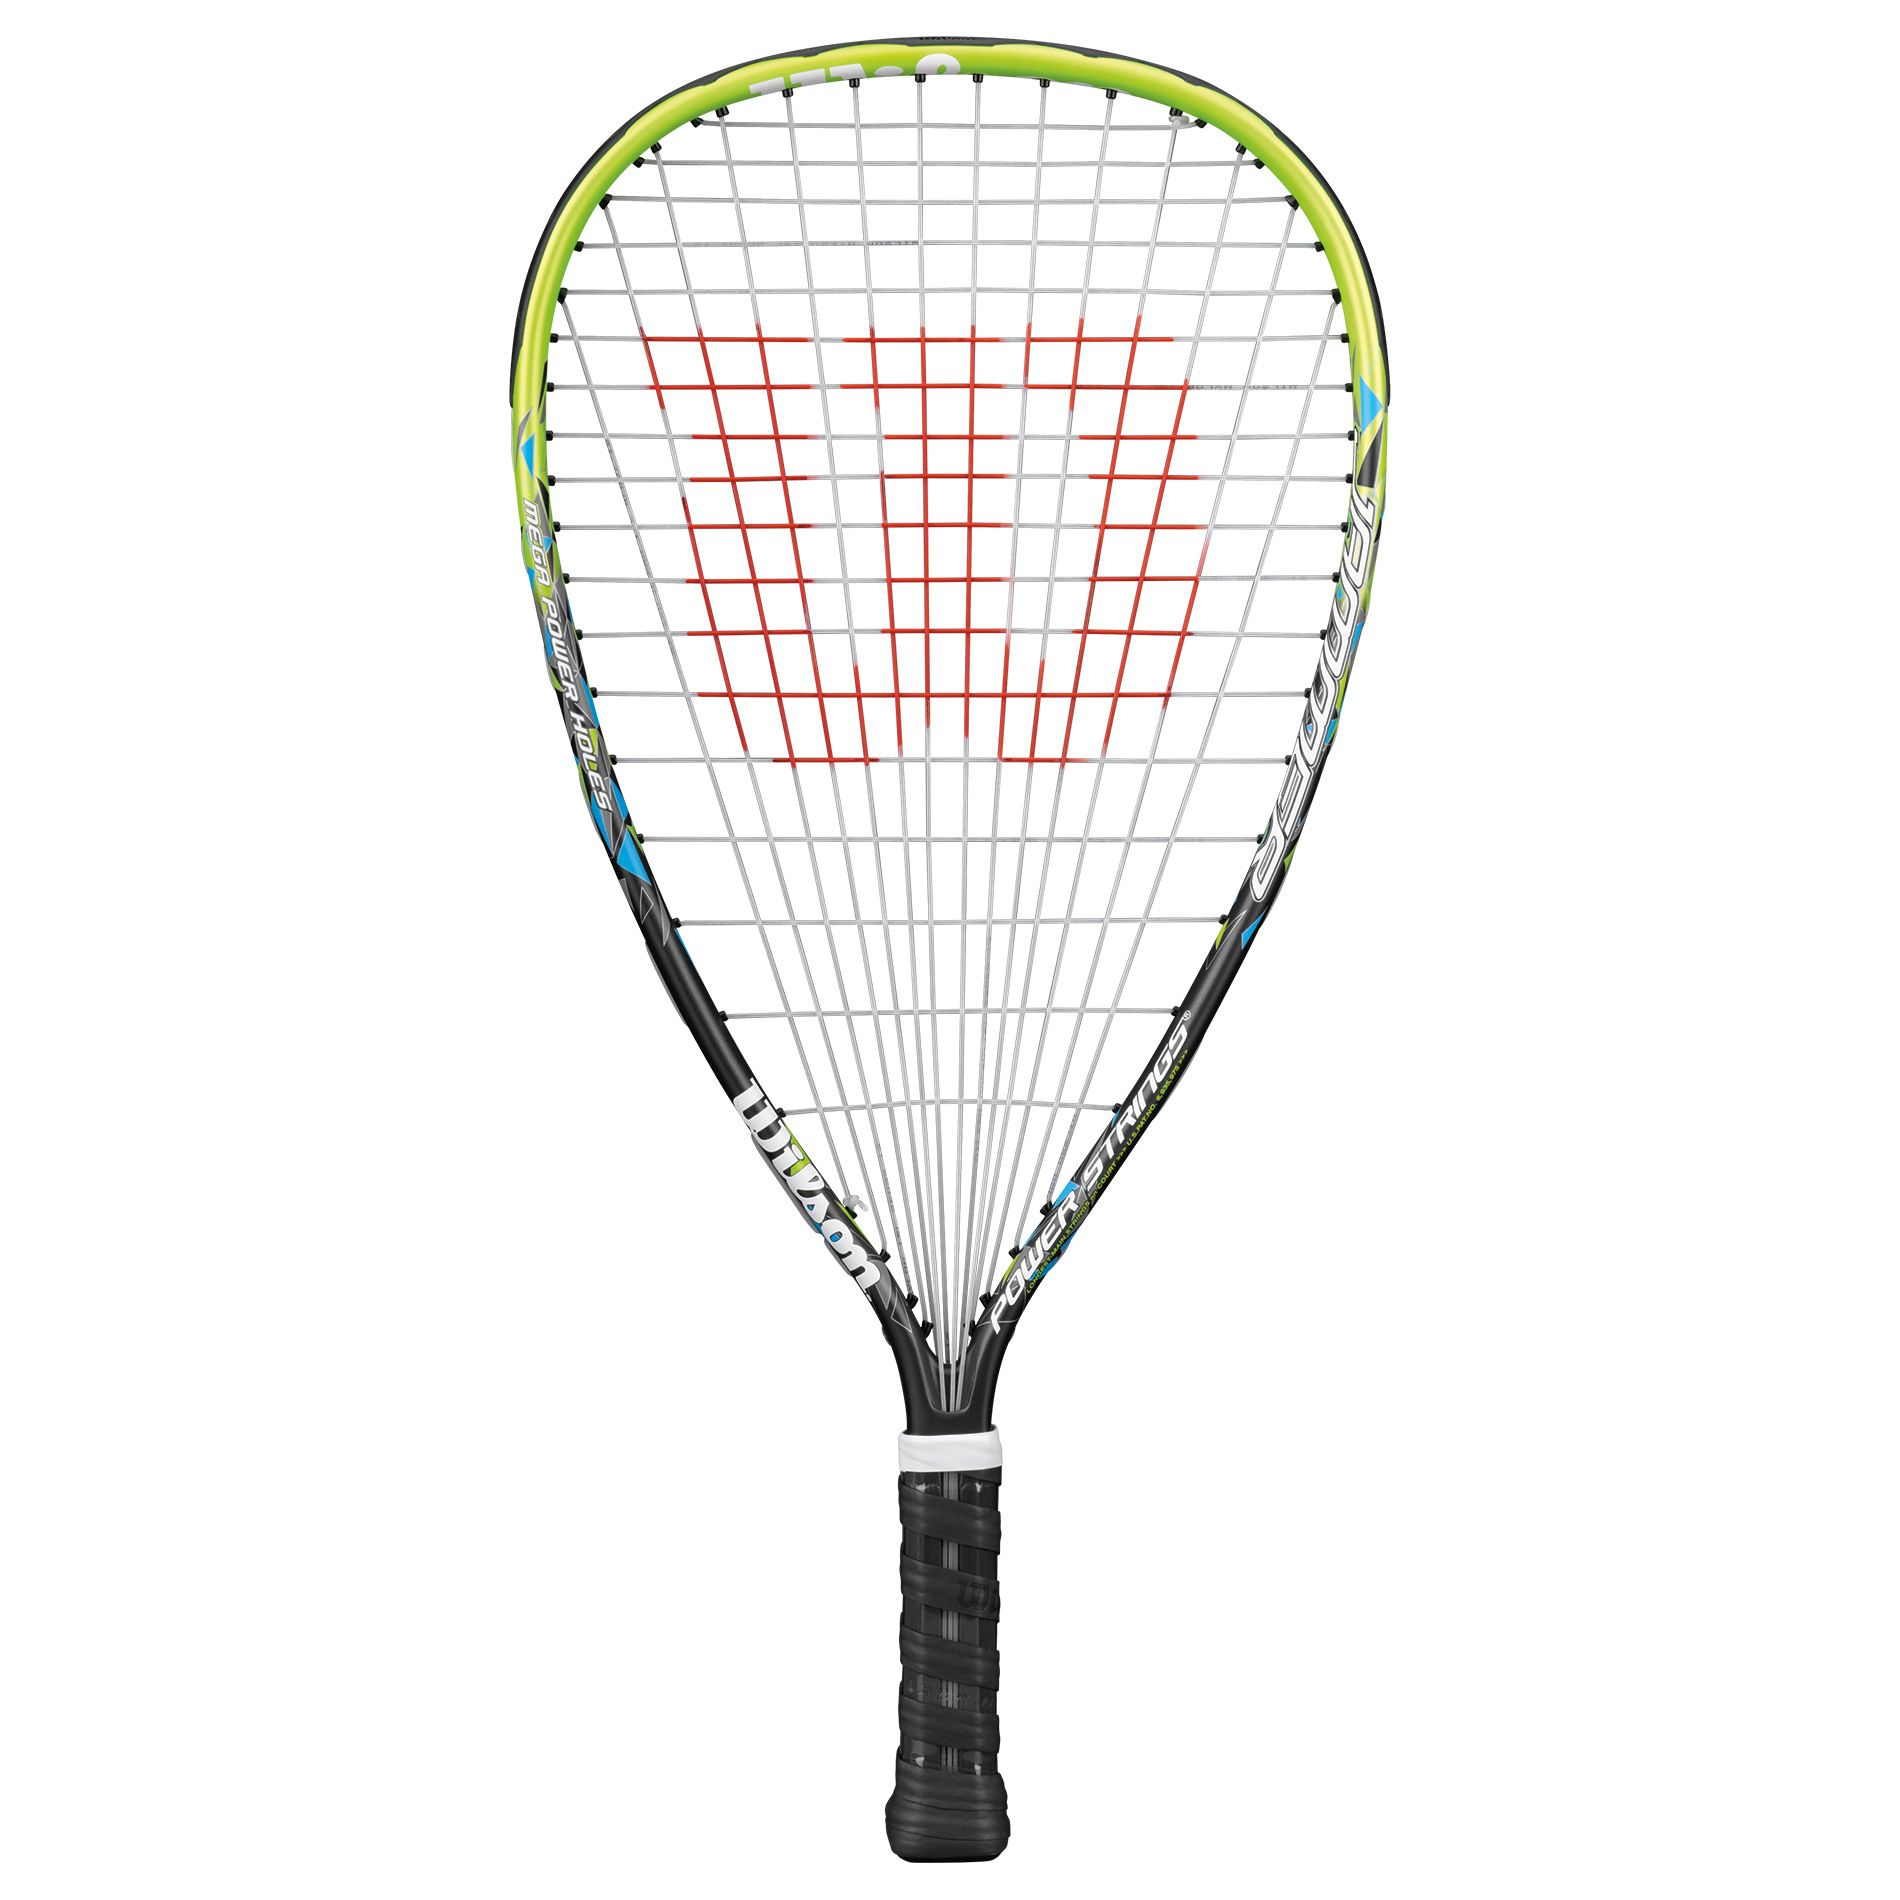 Wilson Jammer Racketball Racket